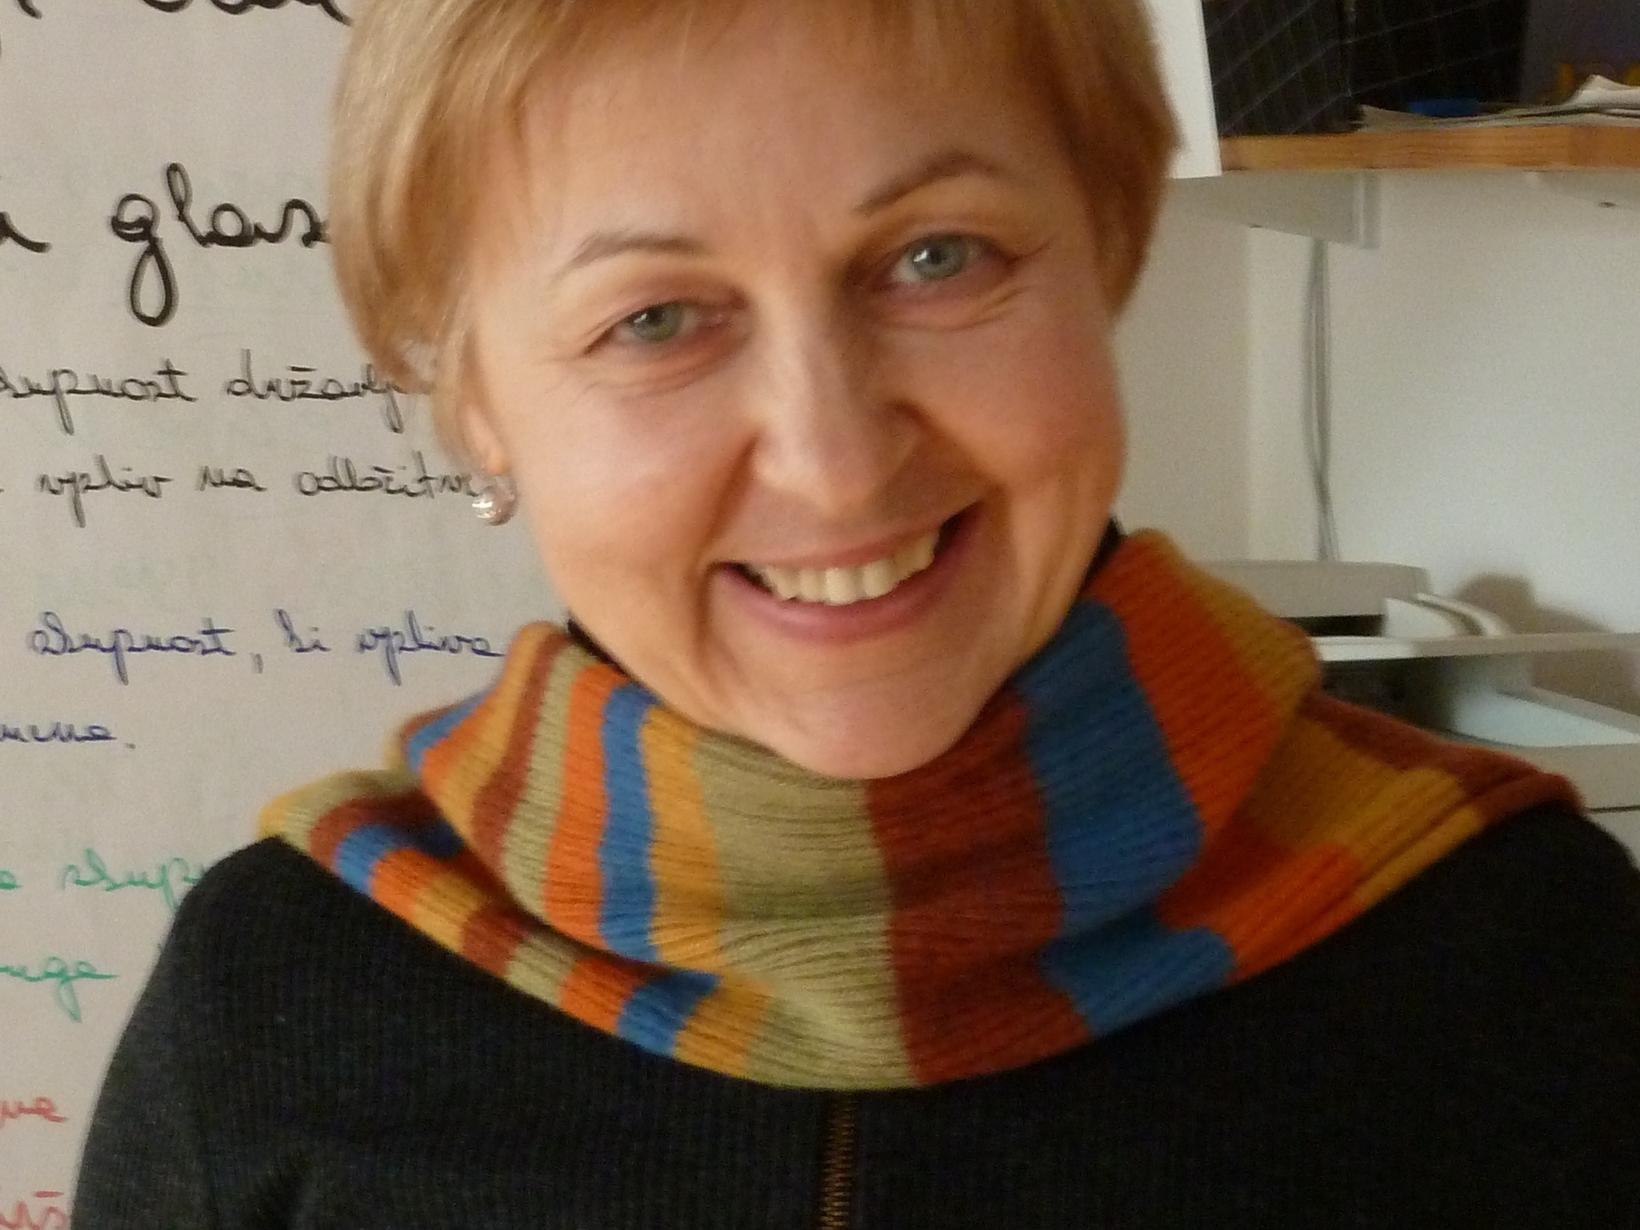 Renata from Ljubljana, Slovenia